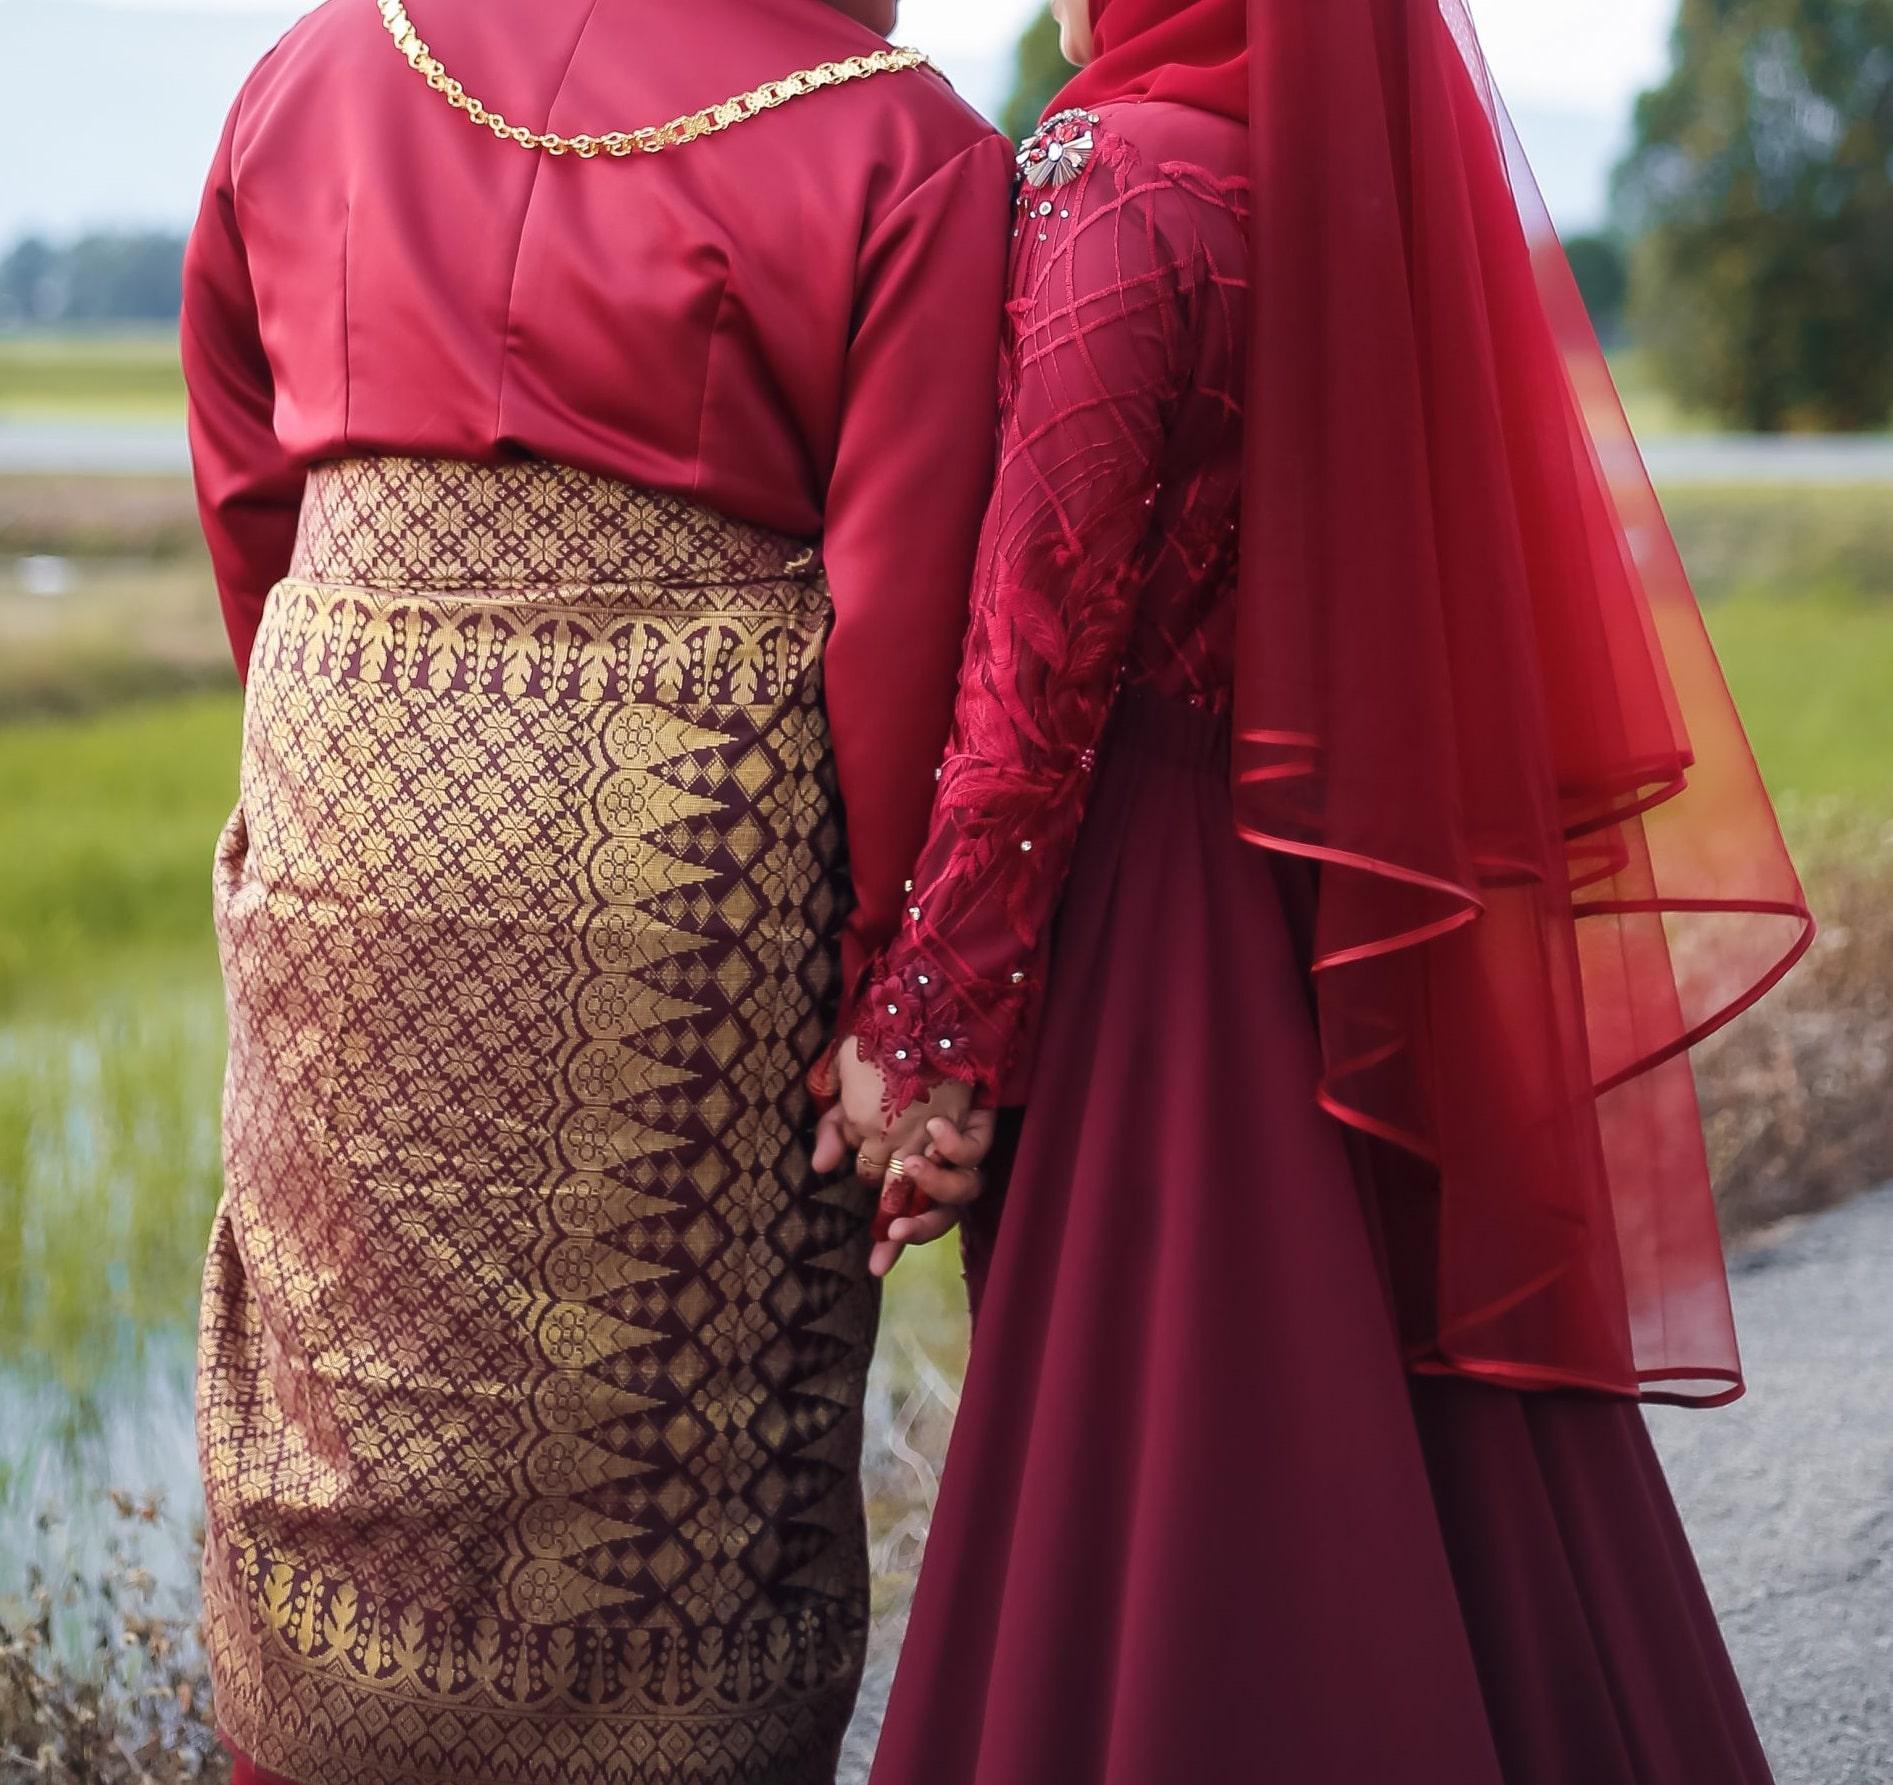 Kahwin 6 Tahun Tapi Menantu Asyik Gugur, Mak Mentua Pula Desak Anak Kahwin Baru